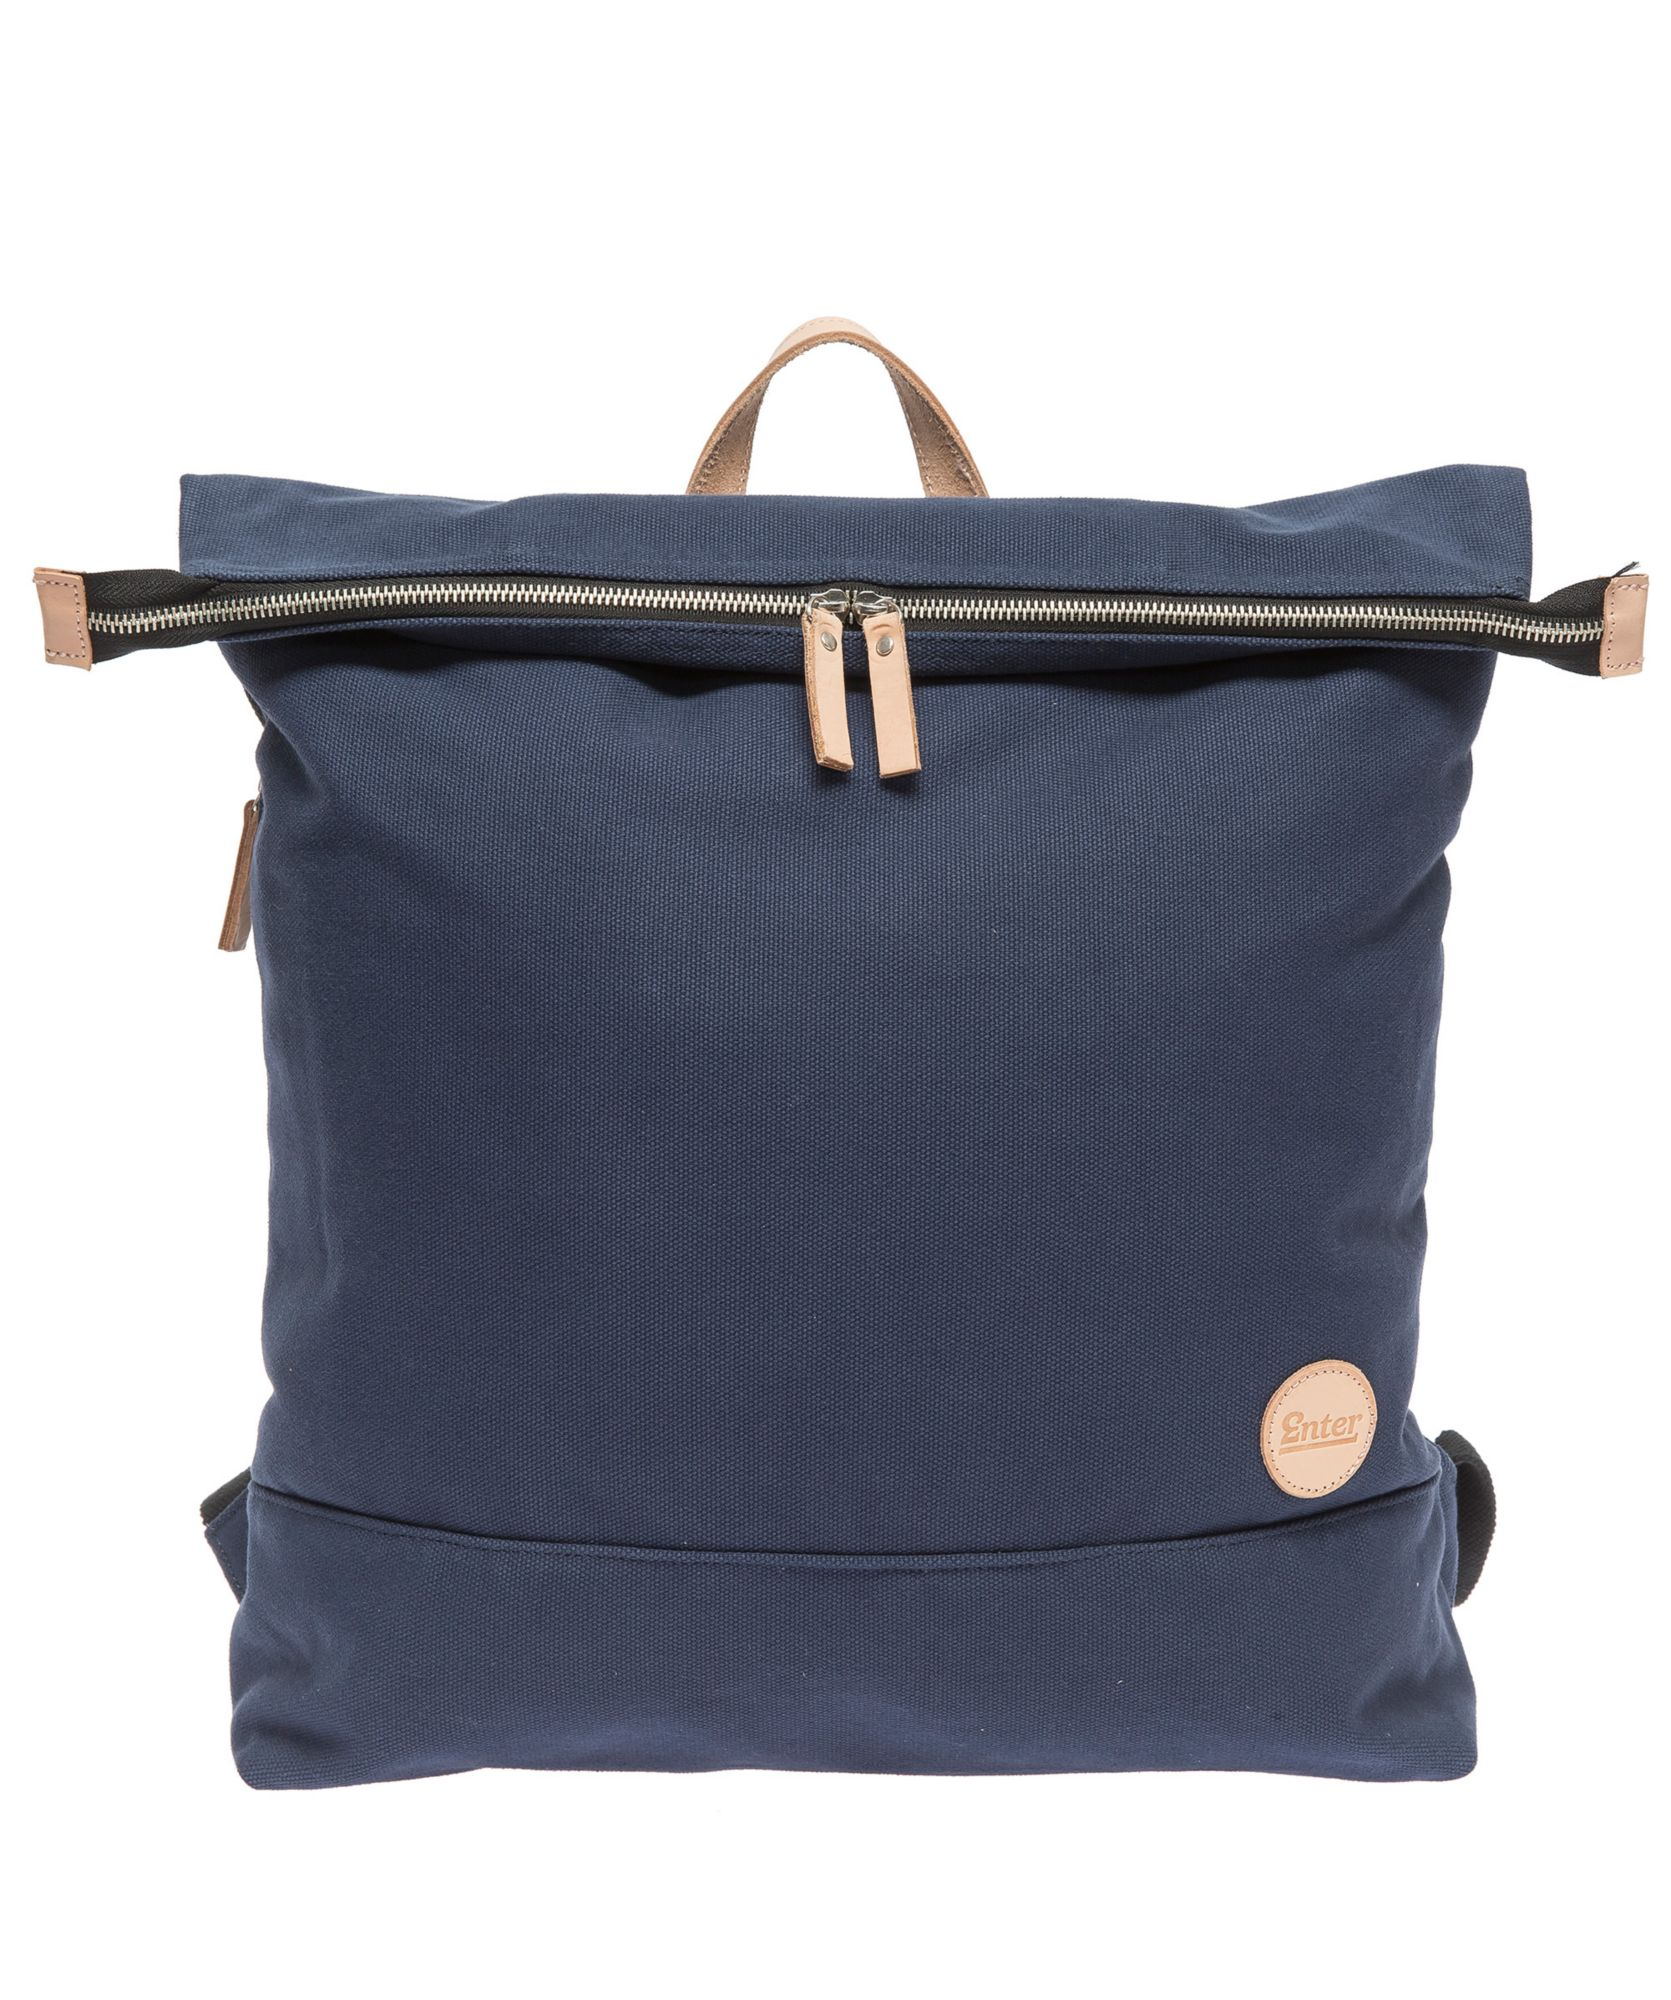 ENTER Enter Rucksack mit Laptop-Trennwand, »Top Zip Backpack, Navy/Natural«